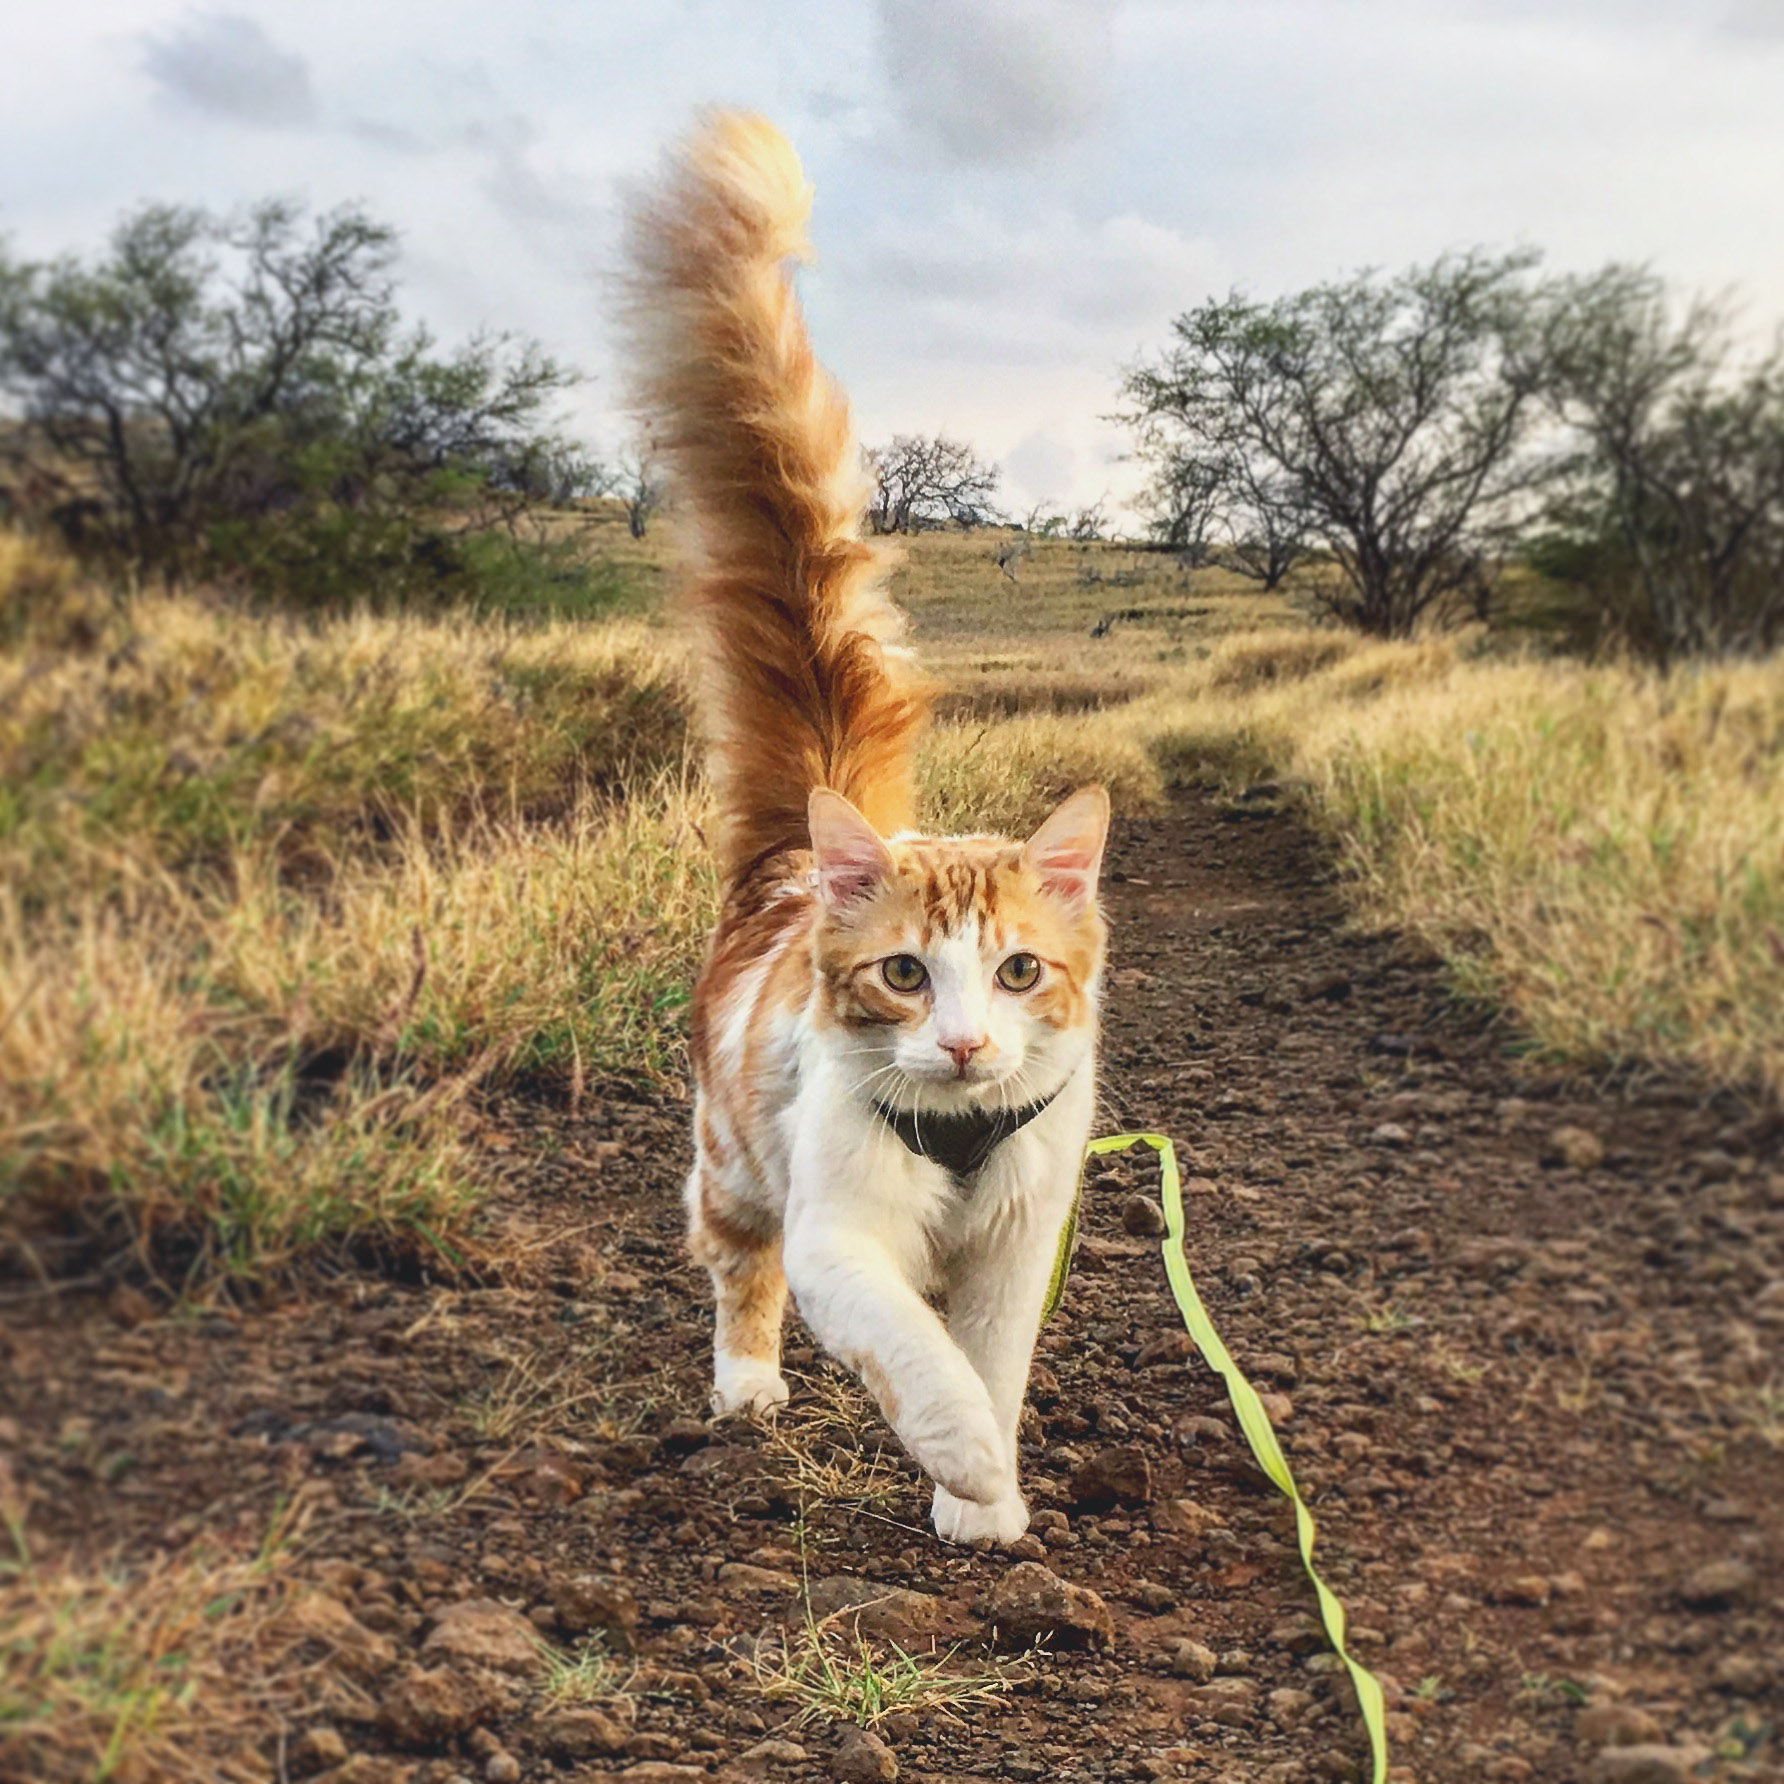 Atlas the cat running on leash